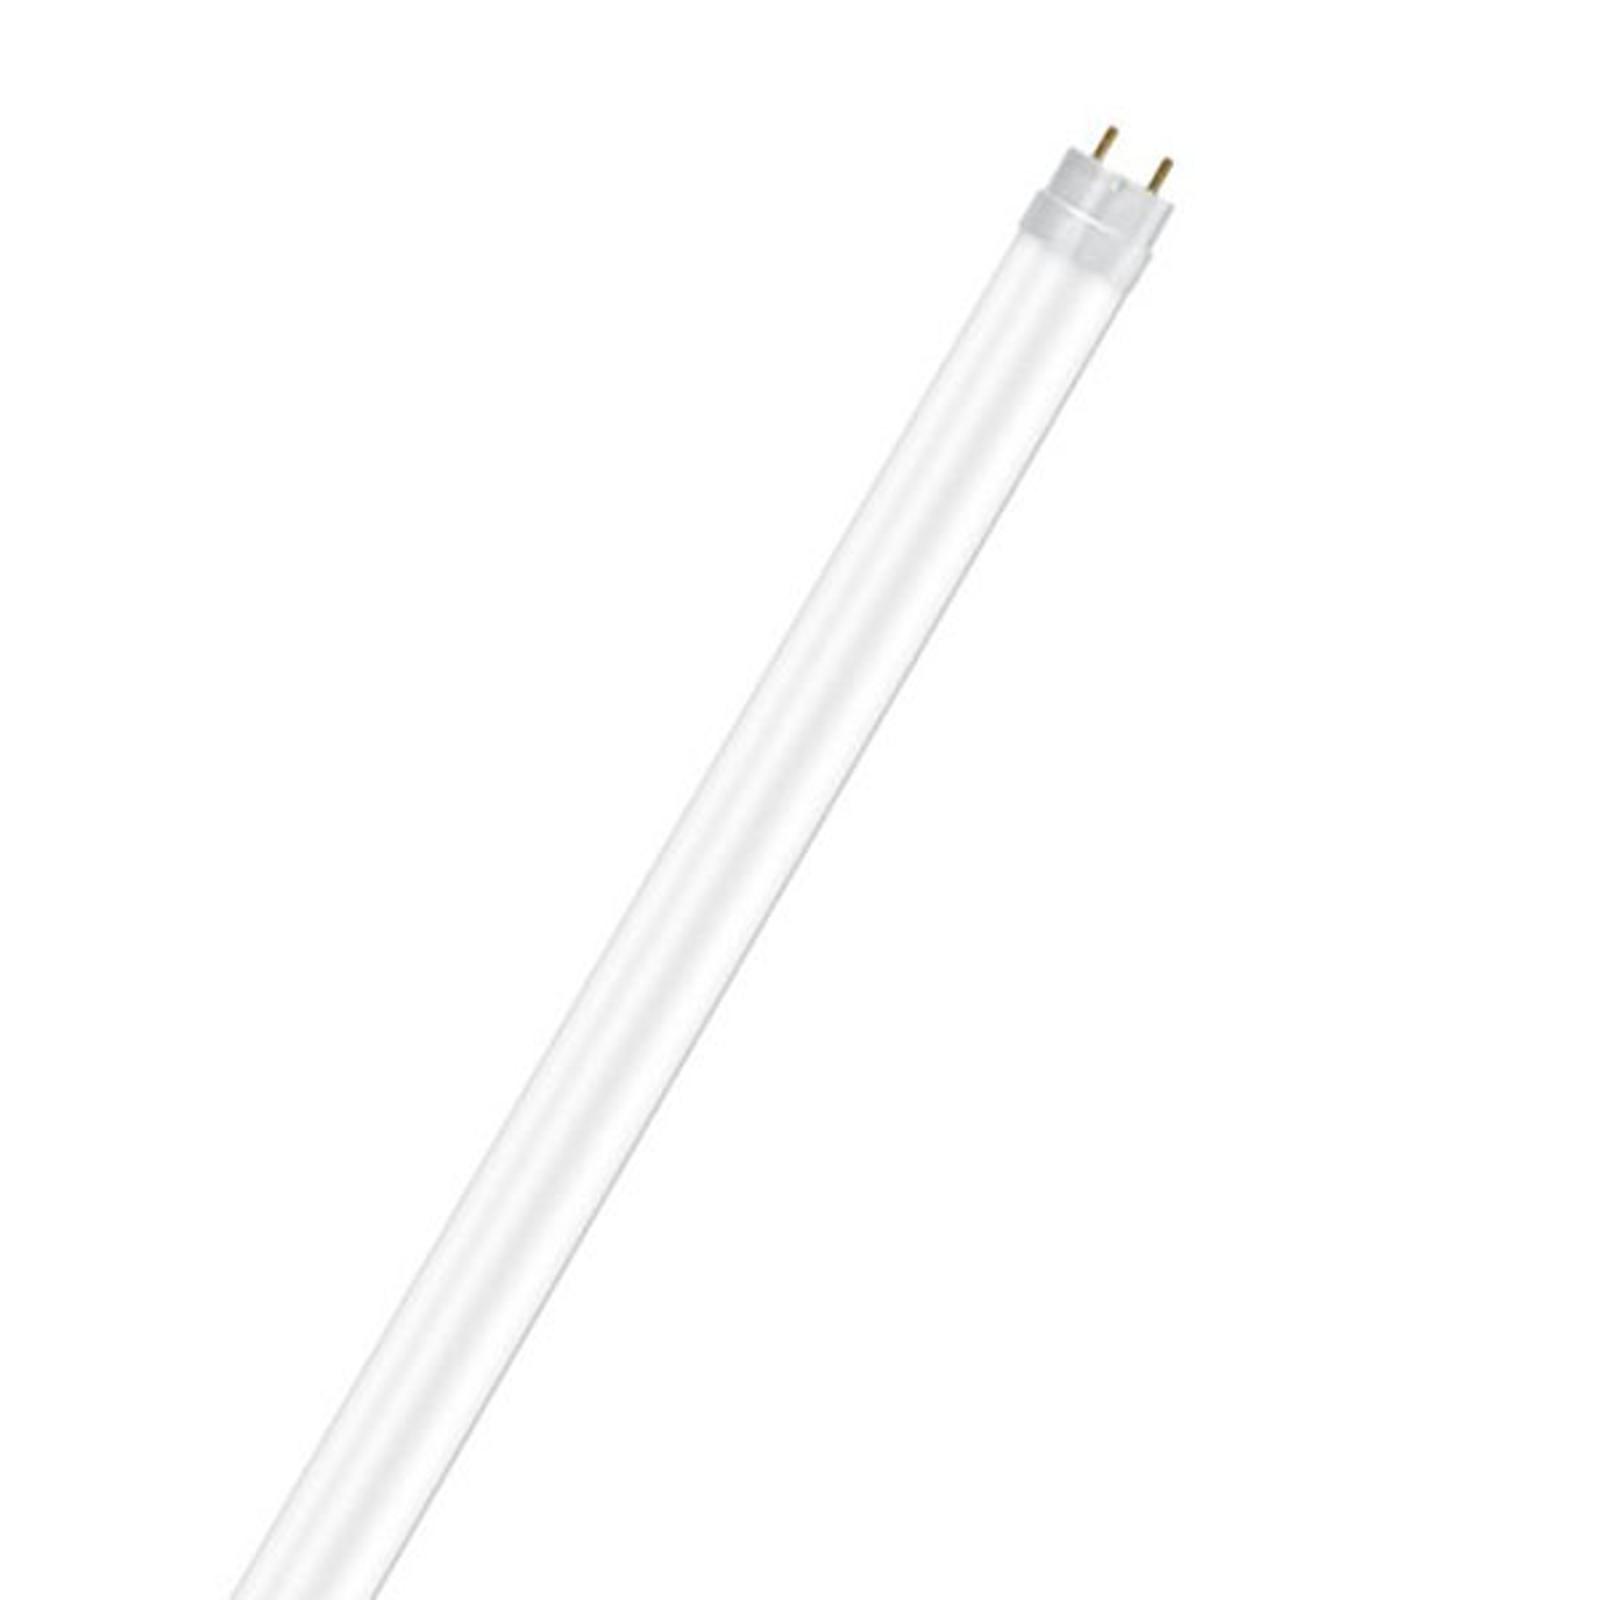 OSRAM LED-Röhre G13 150cm SubstiTUBE 20W 6500K